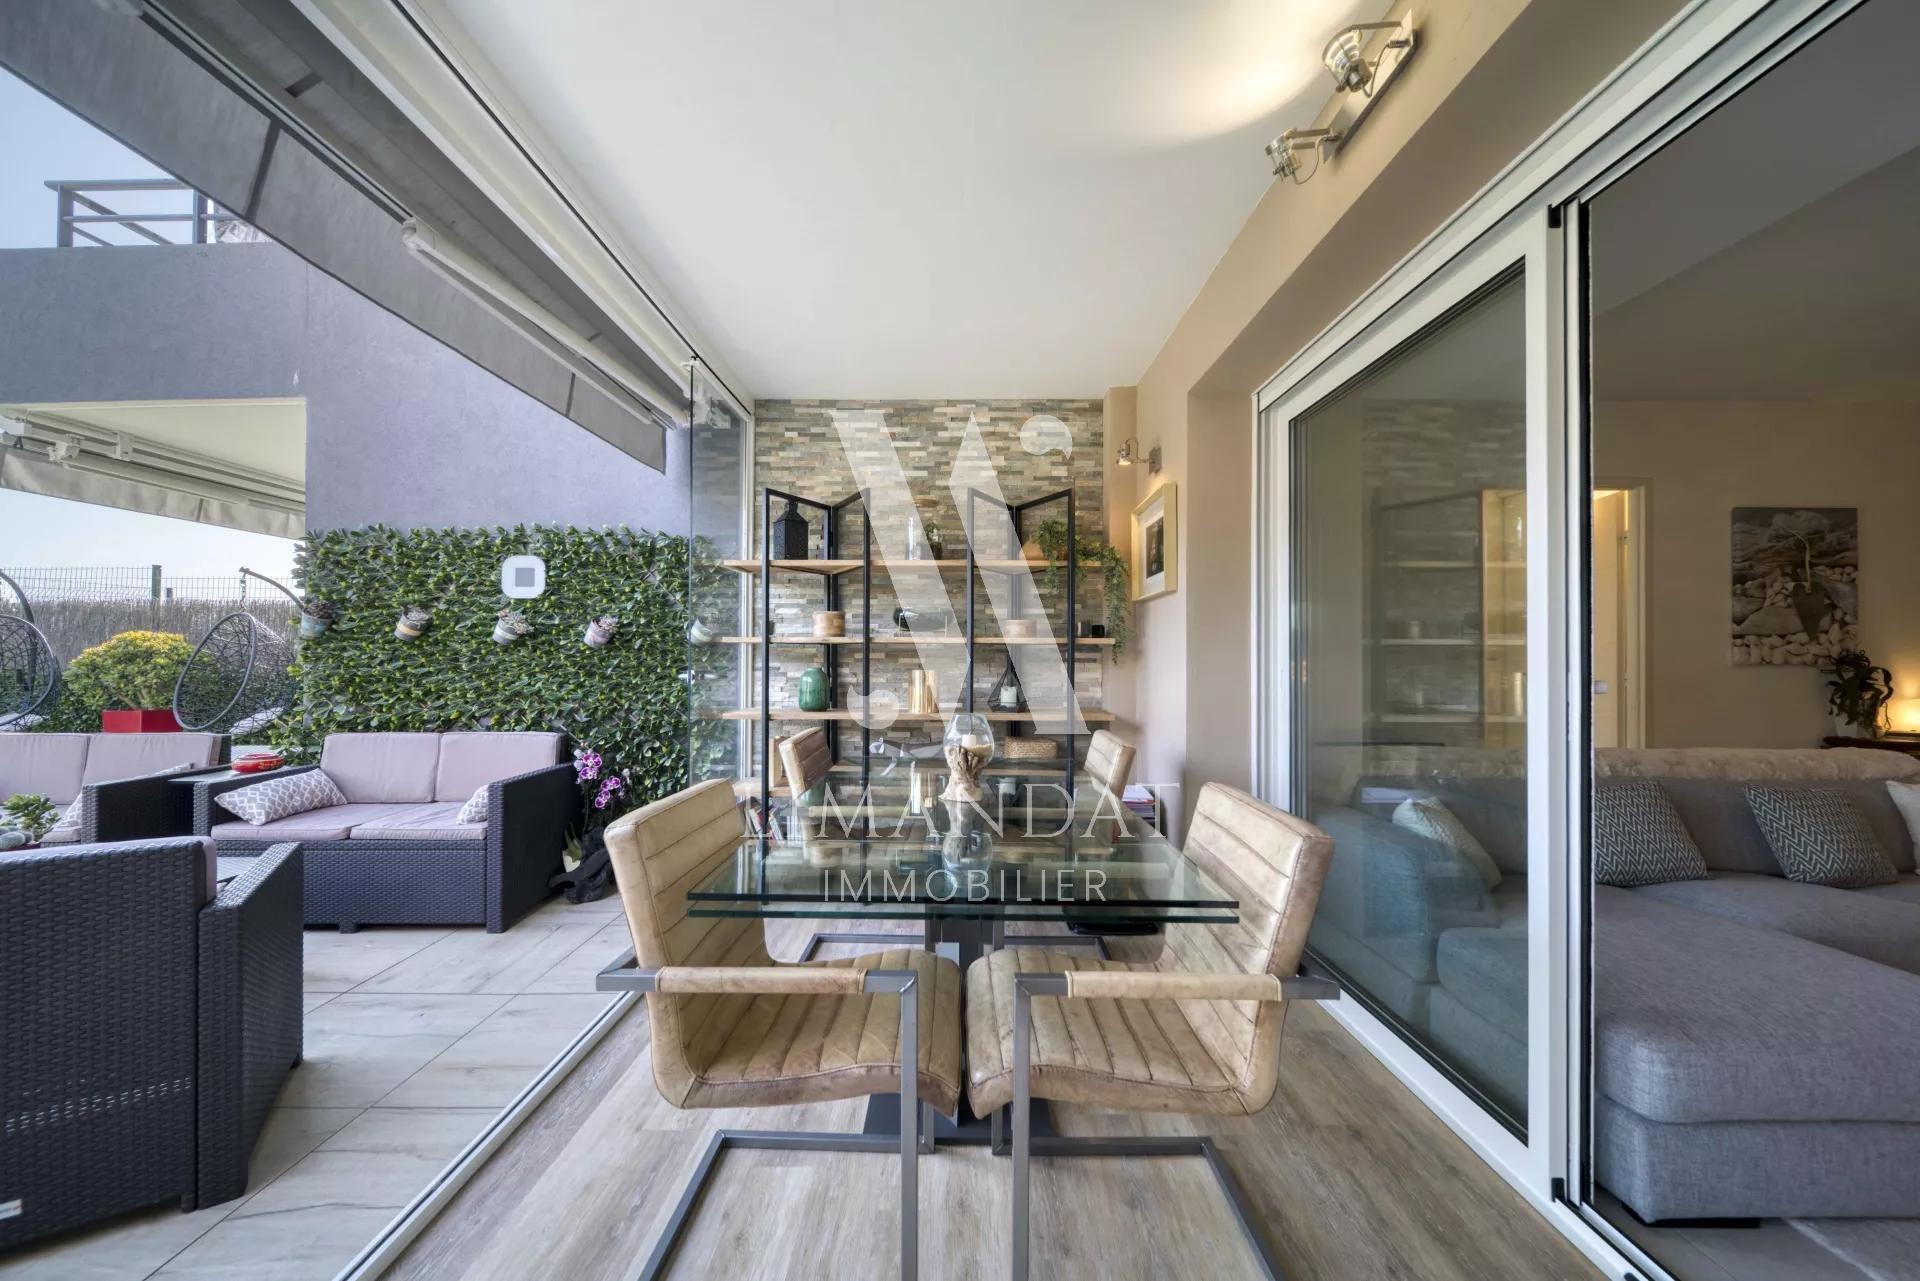 Roquebrune Cap Martin - 3 locali 68 m2 terrazza 34 m2 giardino 44 m2 garage